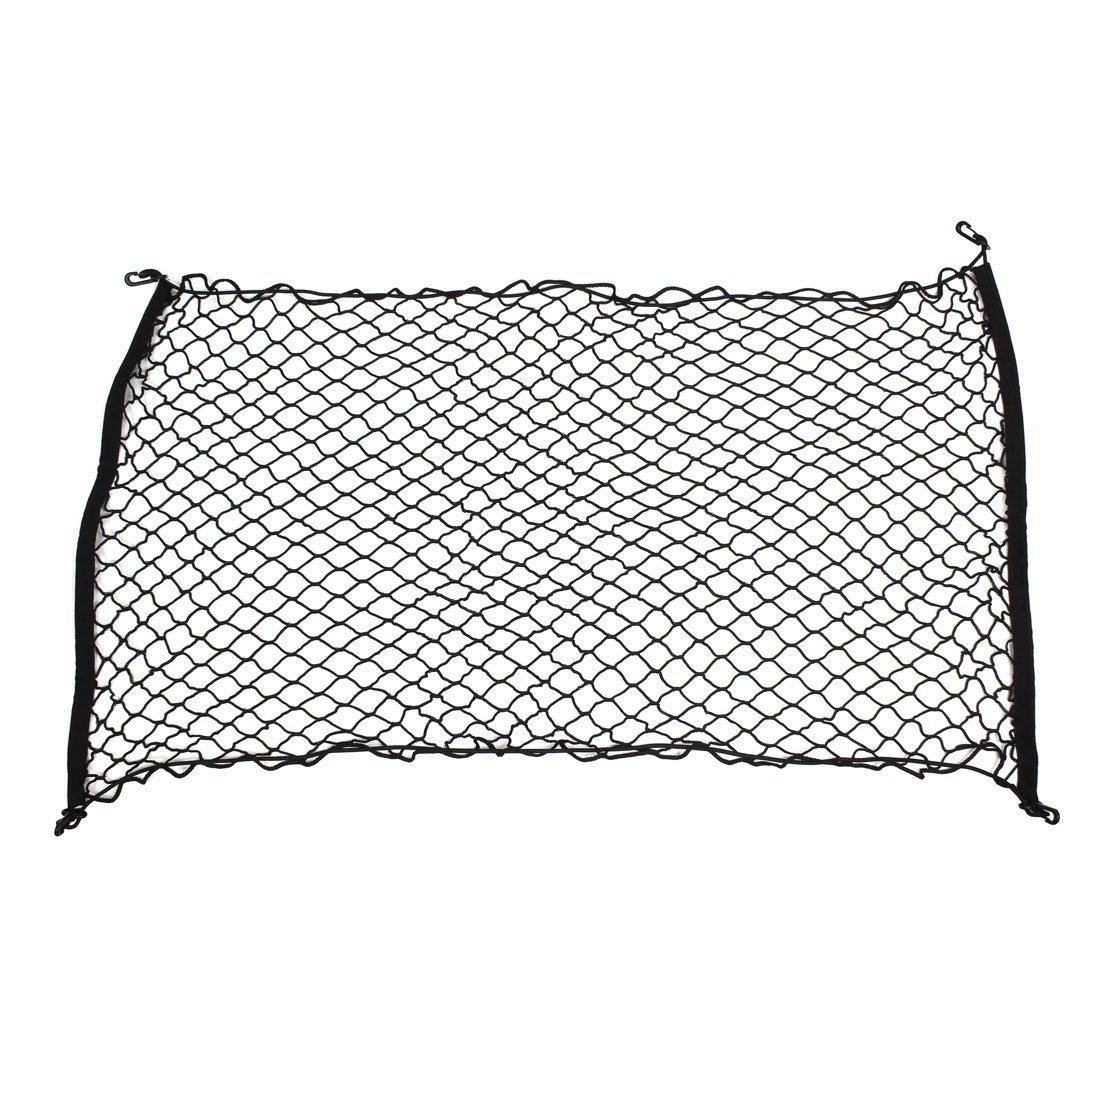 uxcell Car Black Nylon Luggage Cargo Net Holder Elastic Storage 120cm x 70cm